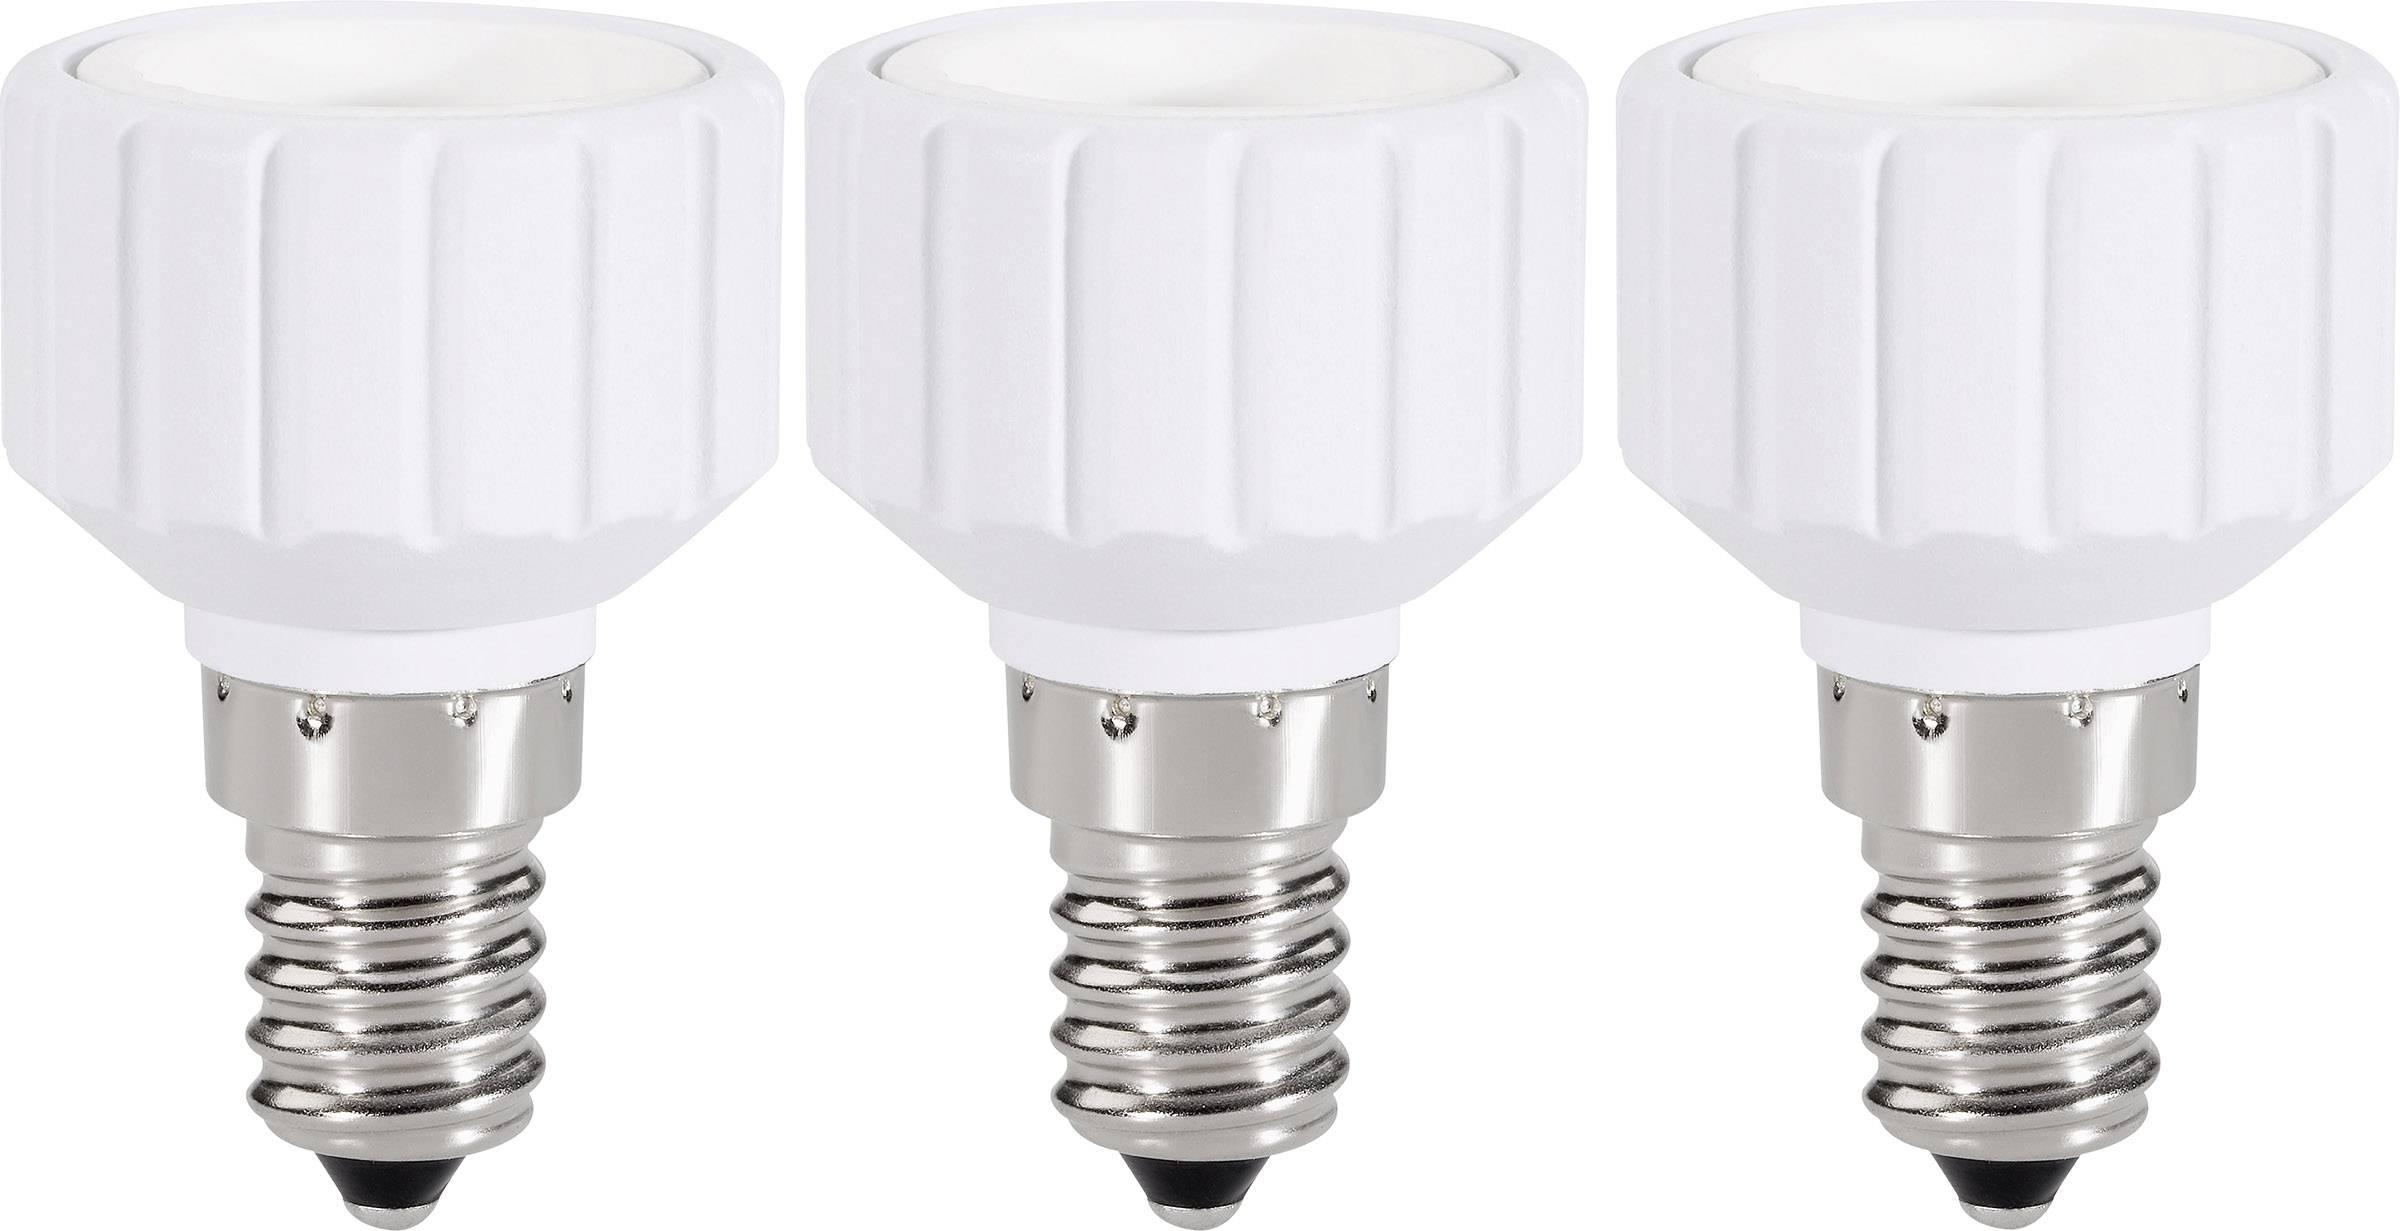 Redukcia Renkforce pre E14 ⇔ GU10, 97029c81c, 220 - 250 V, max. 75 W, biela